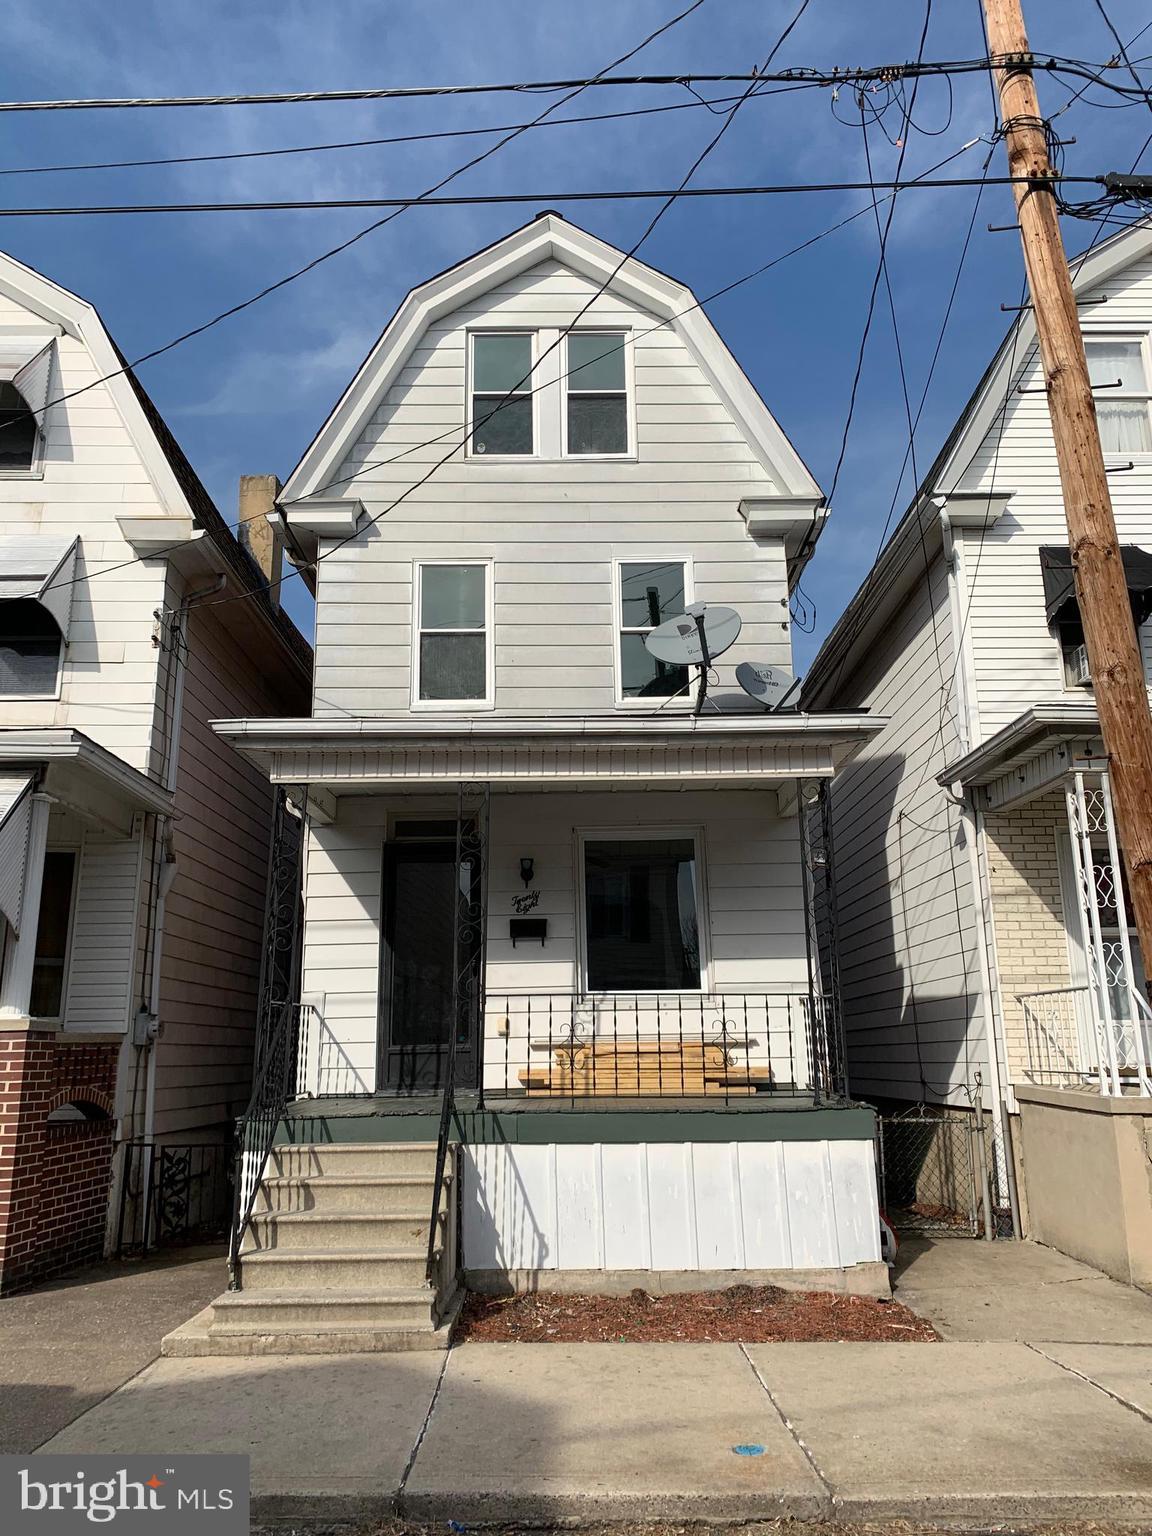 28 E CARBON STREET, MINERSVILLE, PA 17954